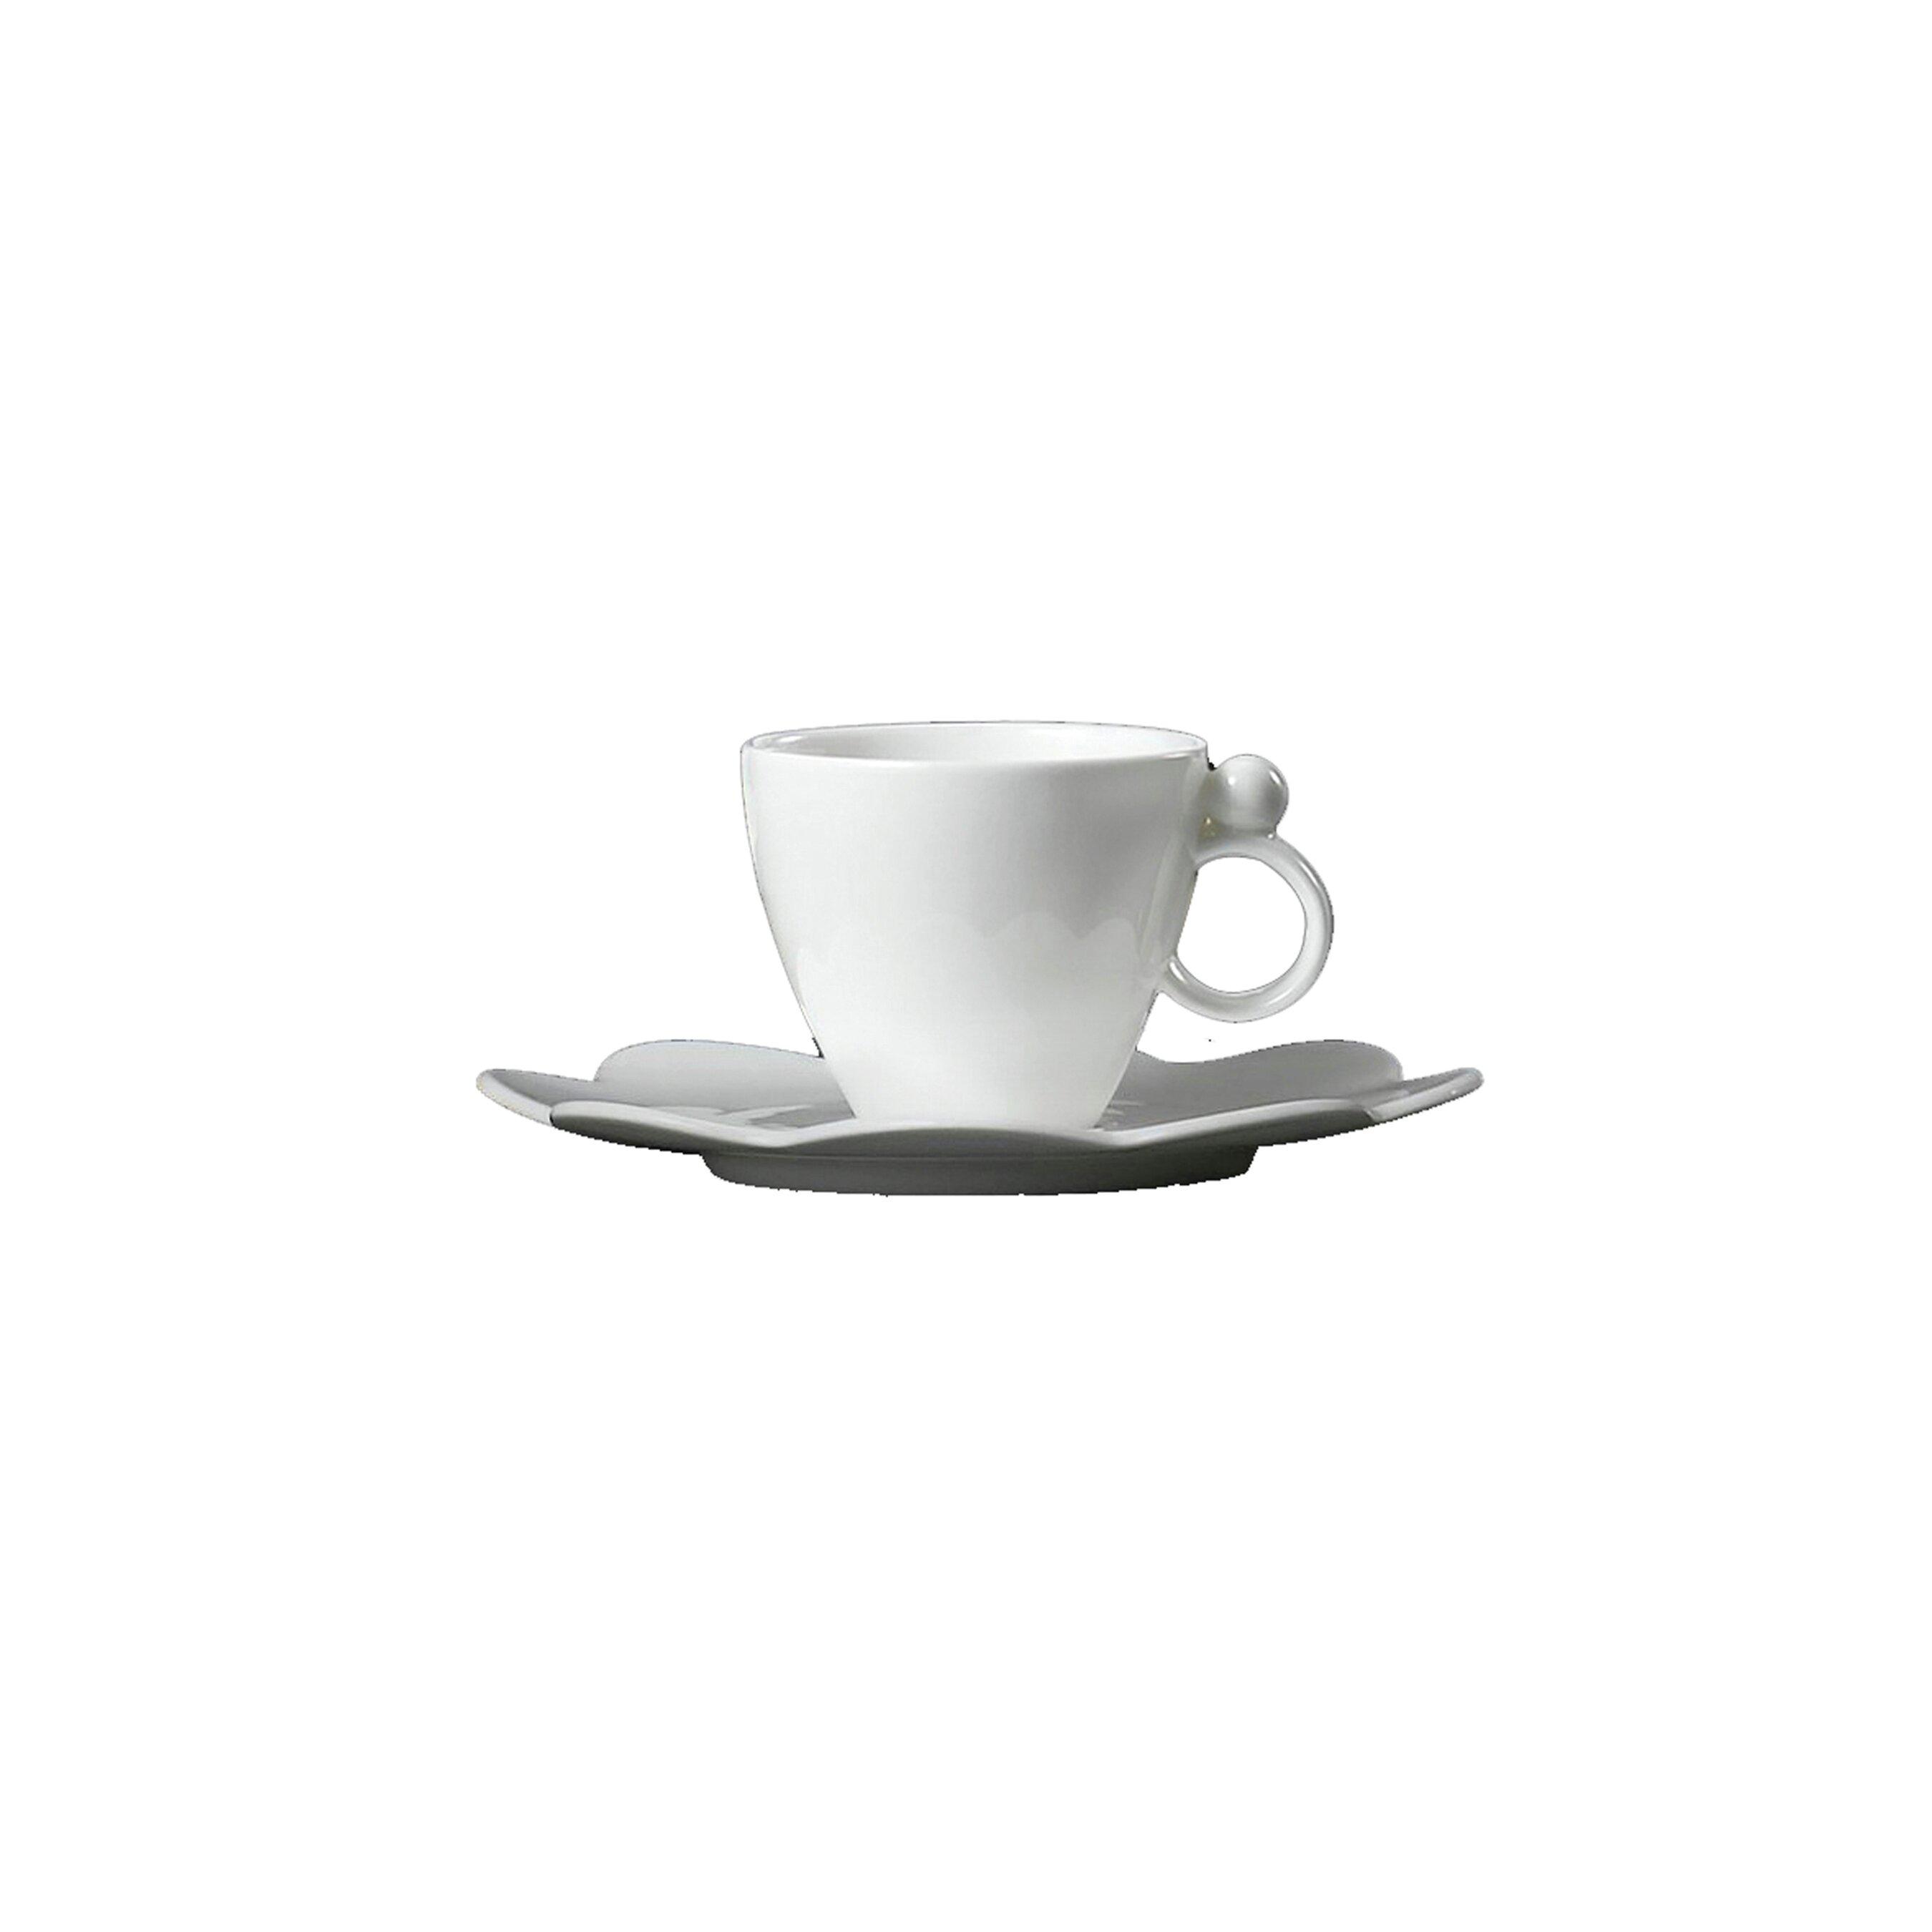 Prouna Geometrica White Bone China Espresso Cup And Saucer Set Of 2 Wayfair